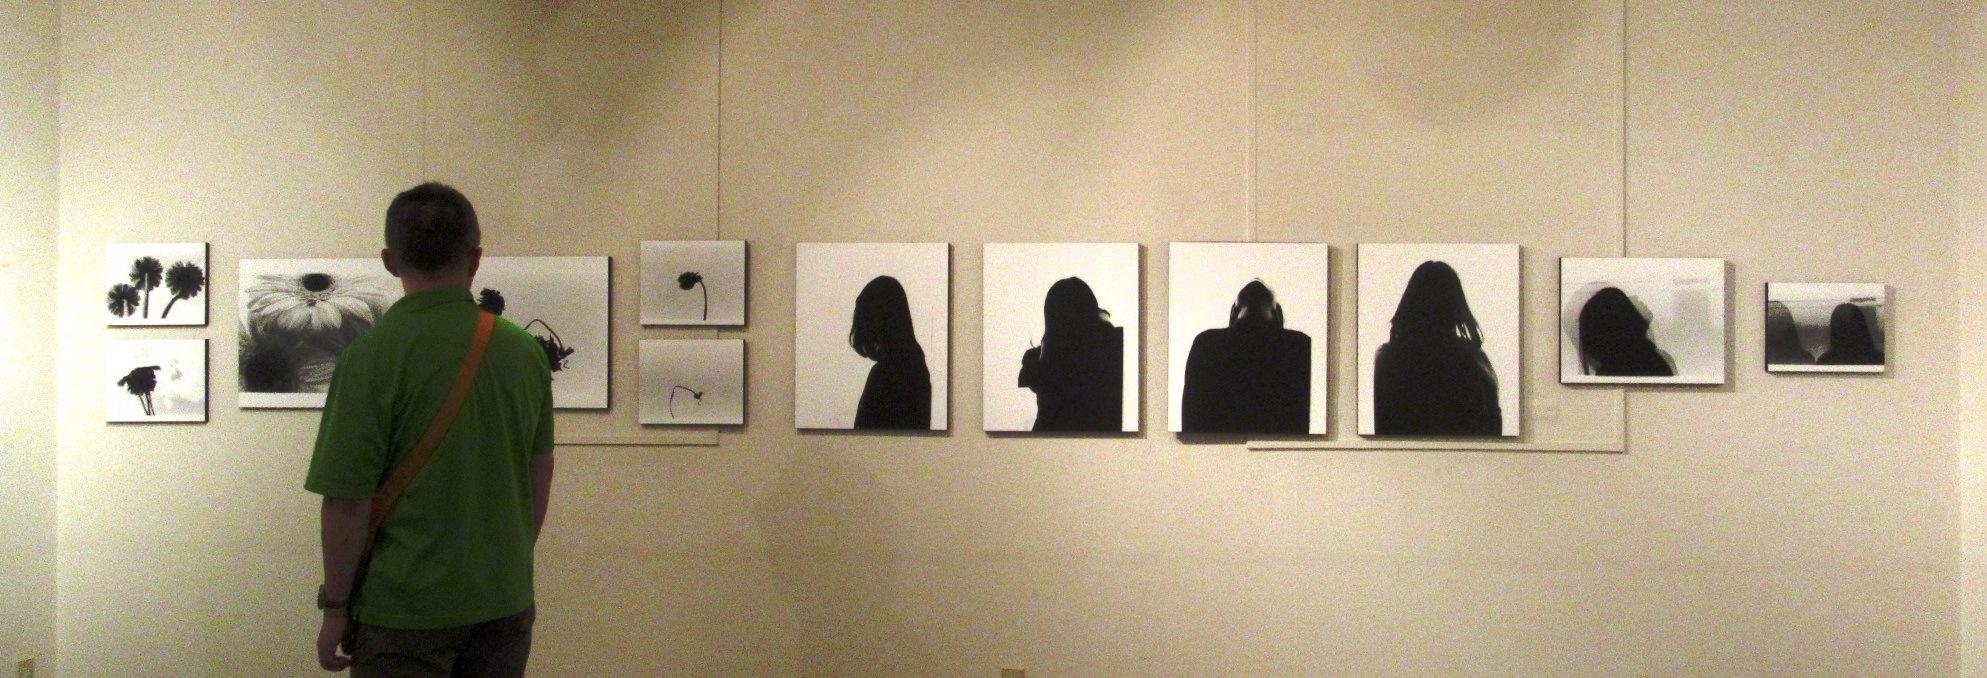 2569)②「『moment』 篠原 奈那子(藤女子大学4年)写真展」 アートスペース201 8月3日(木)~8月7日(火)_f0126829_11113610.jpg